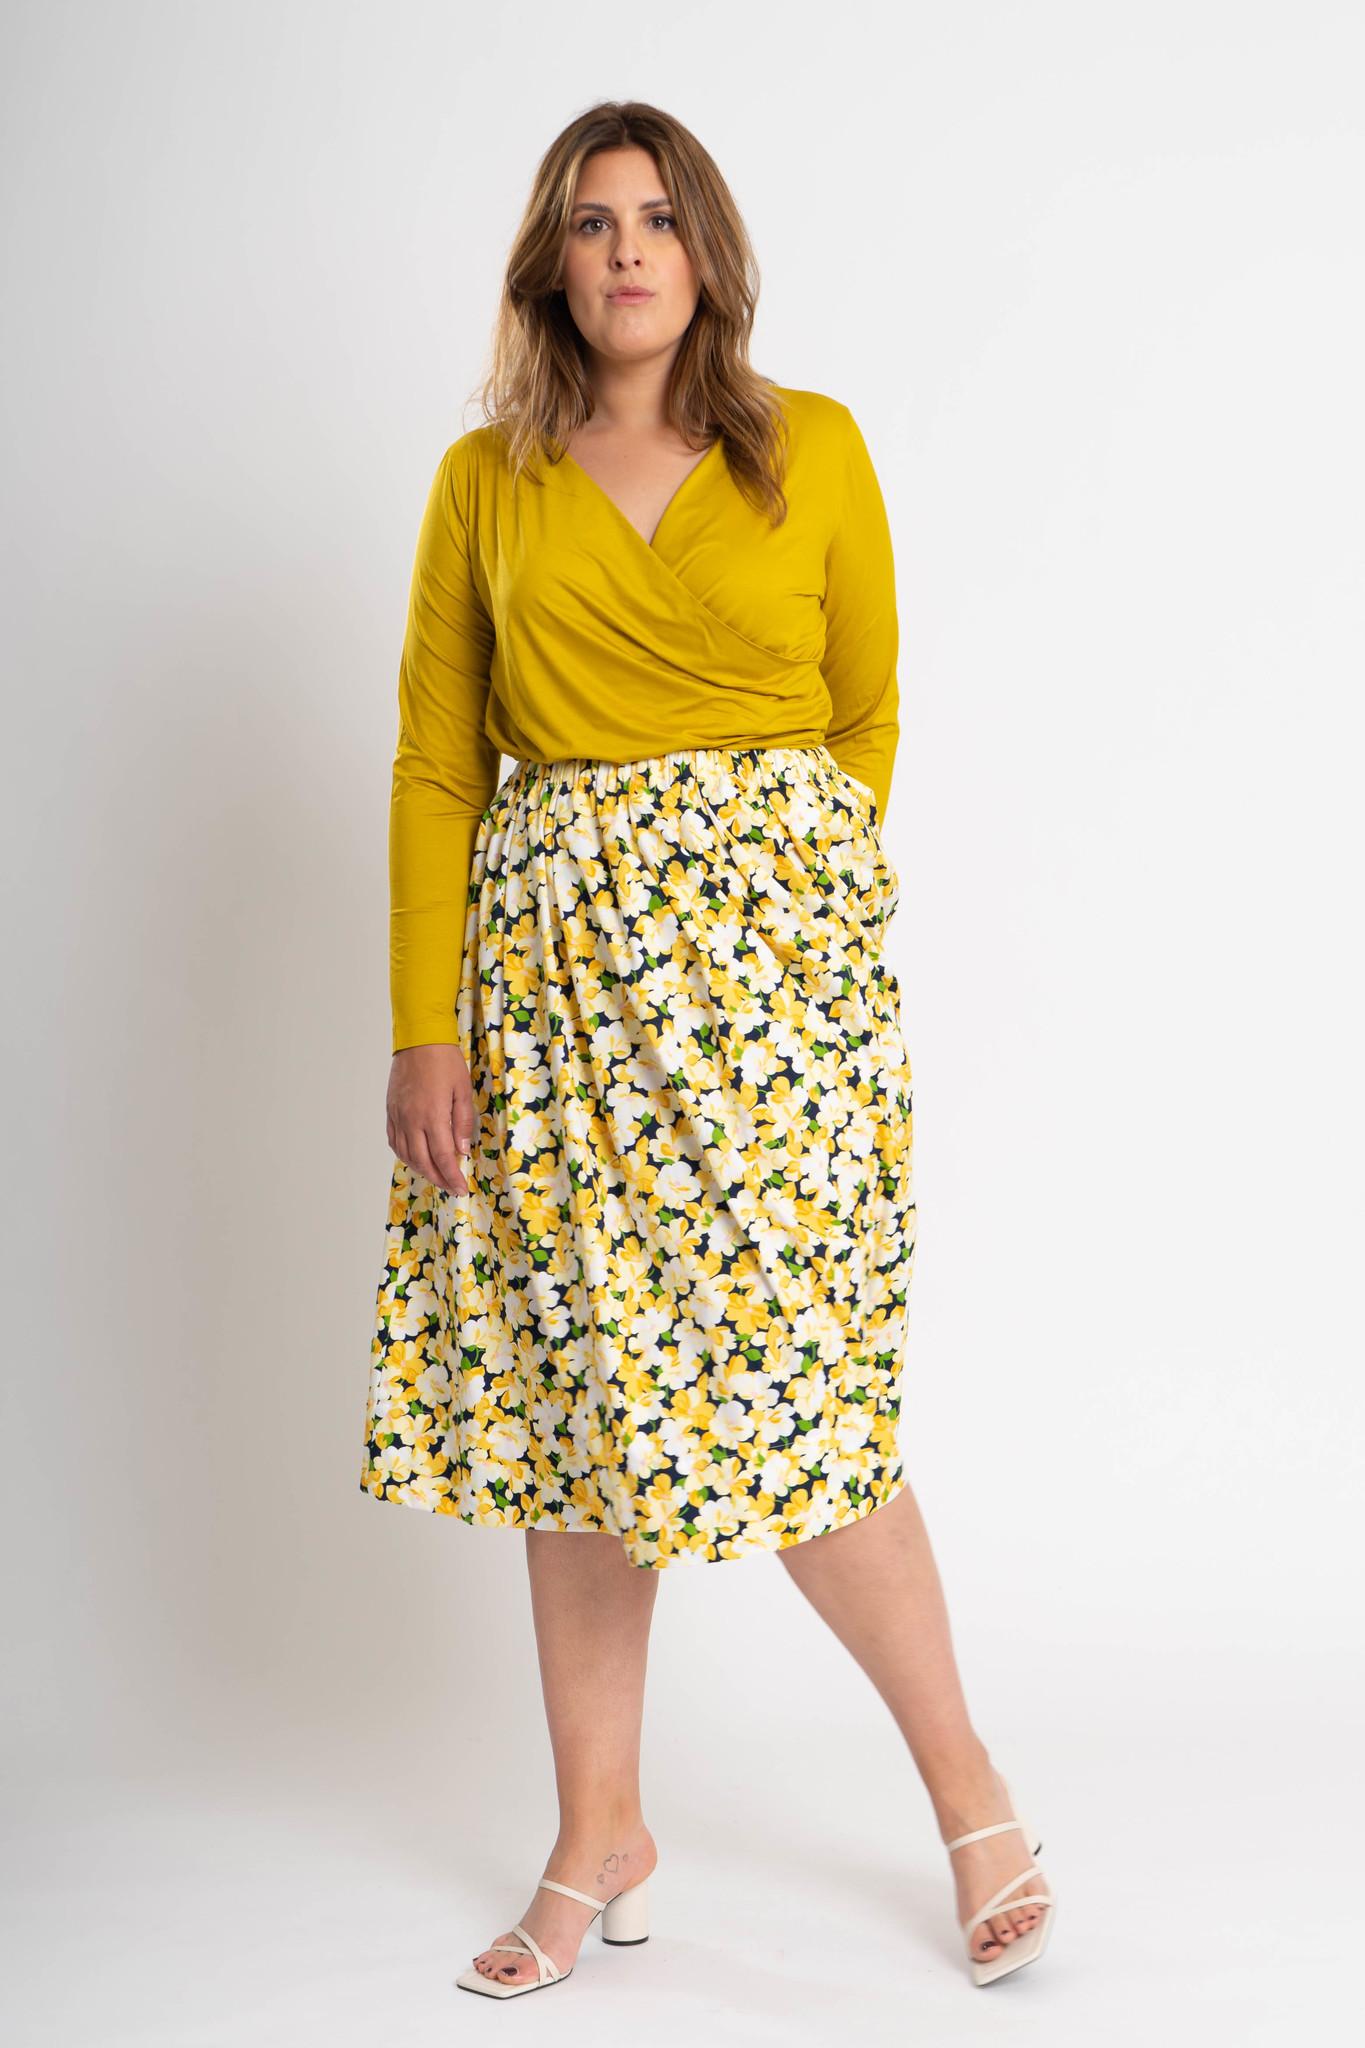 TULIP Skirt in Cotton-6